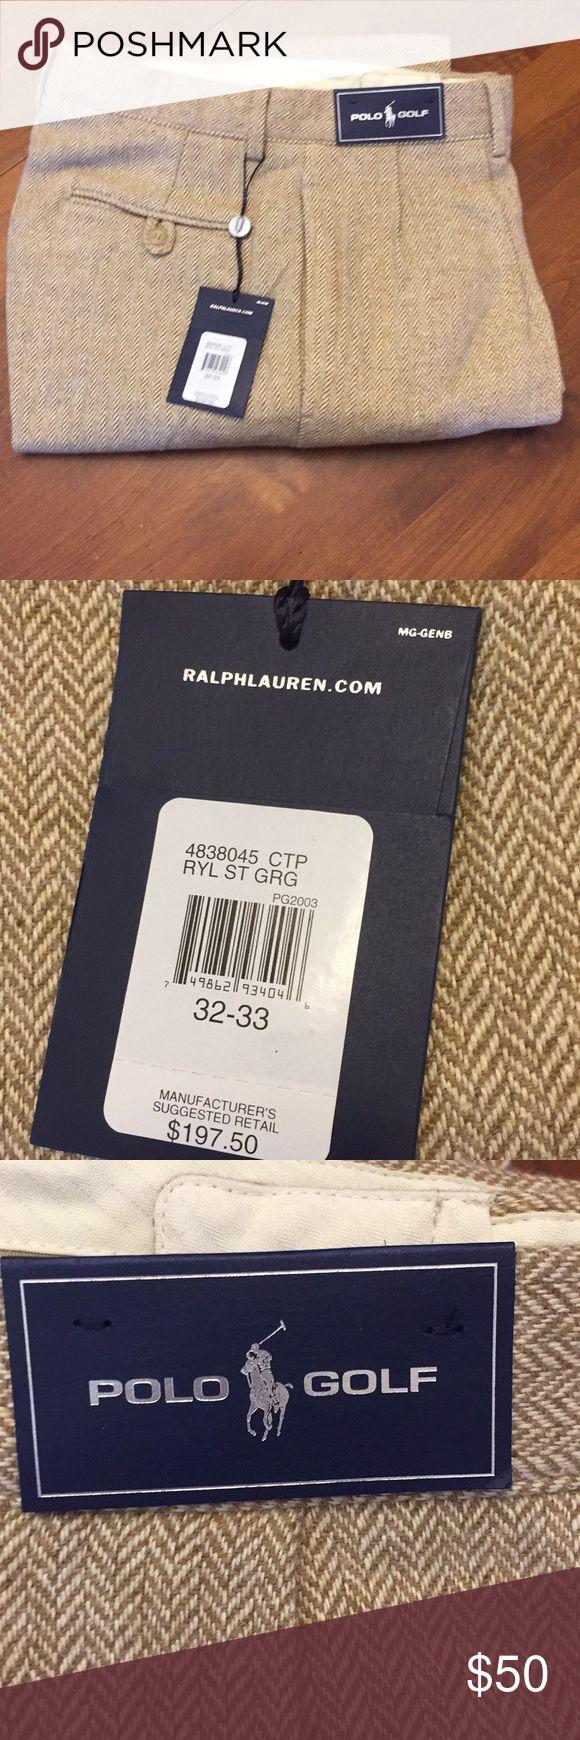 Polo Golf Silk/Wool Pants Tan Herringbone Size 32 Polo Golf Silk/Wool Pants Tan Herringbone Size 32. NWT, Never worn. Original price $197.50. Length 33 inches. Lined.   55% Silk, 45% Wool. Polo by Ralph Lauren Pants Dress